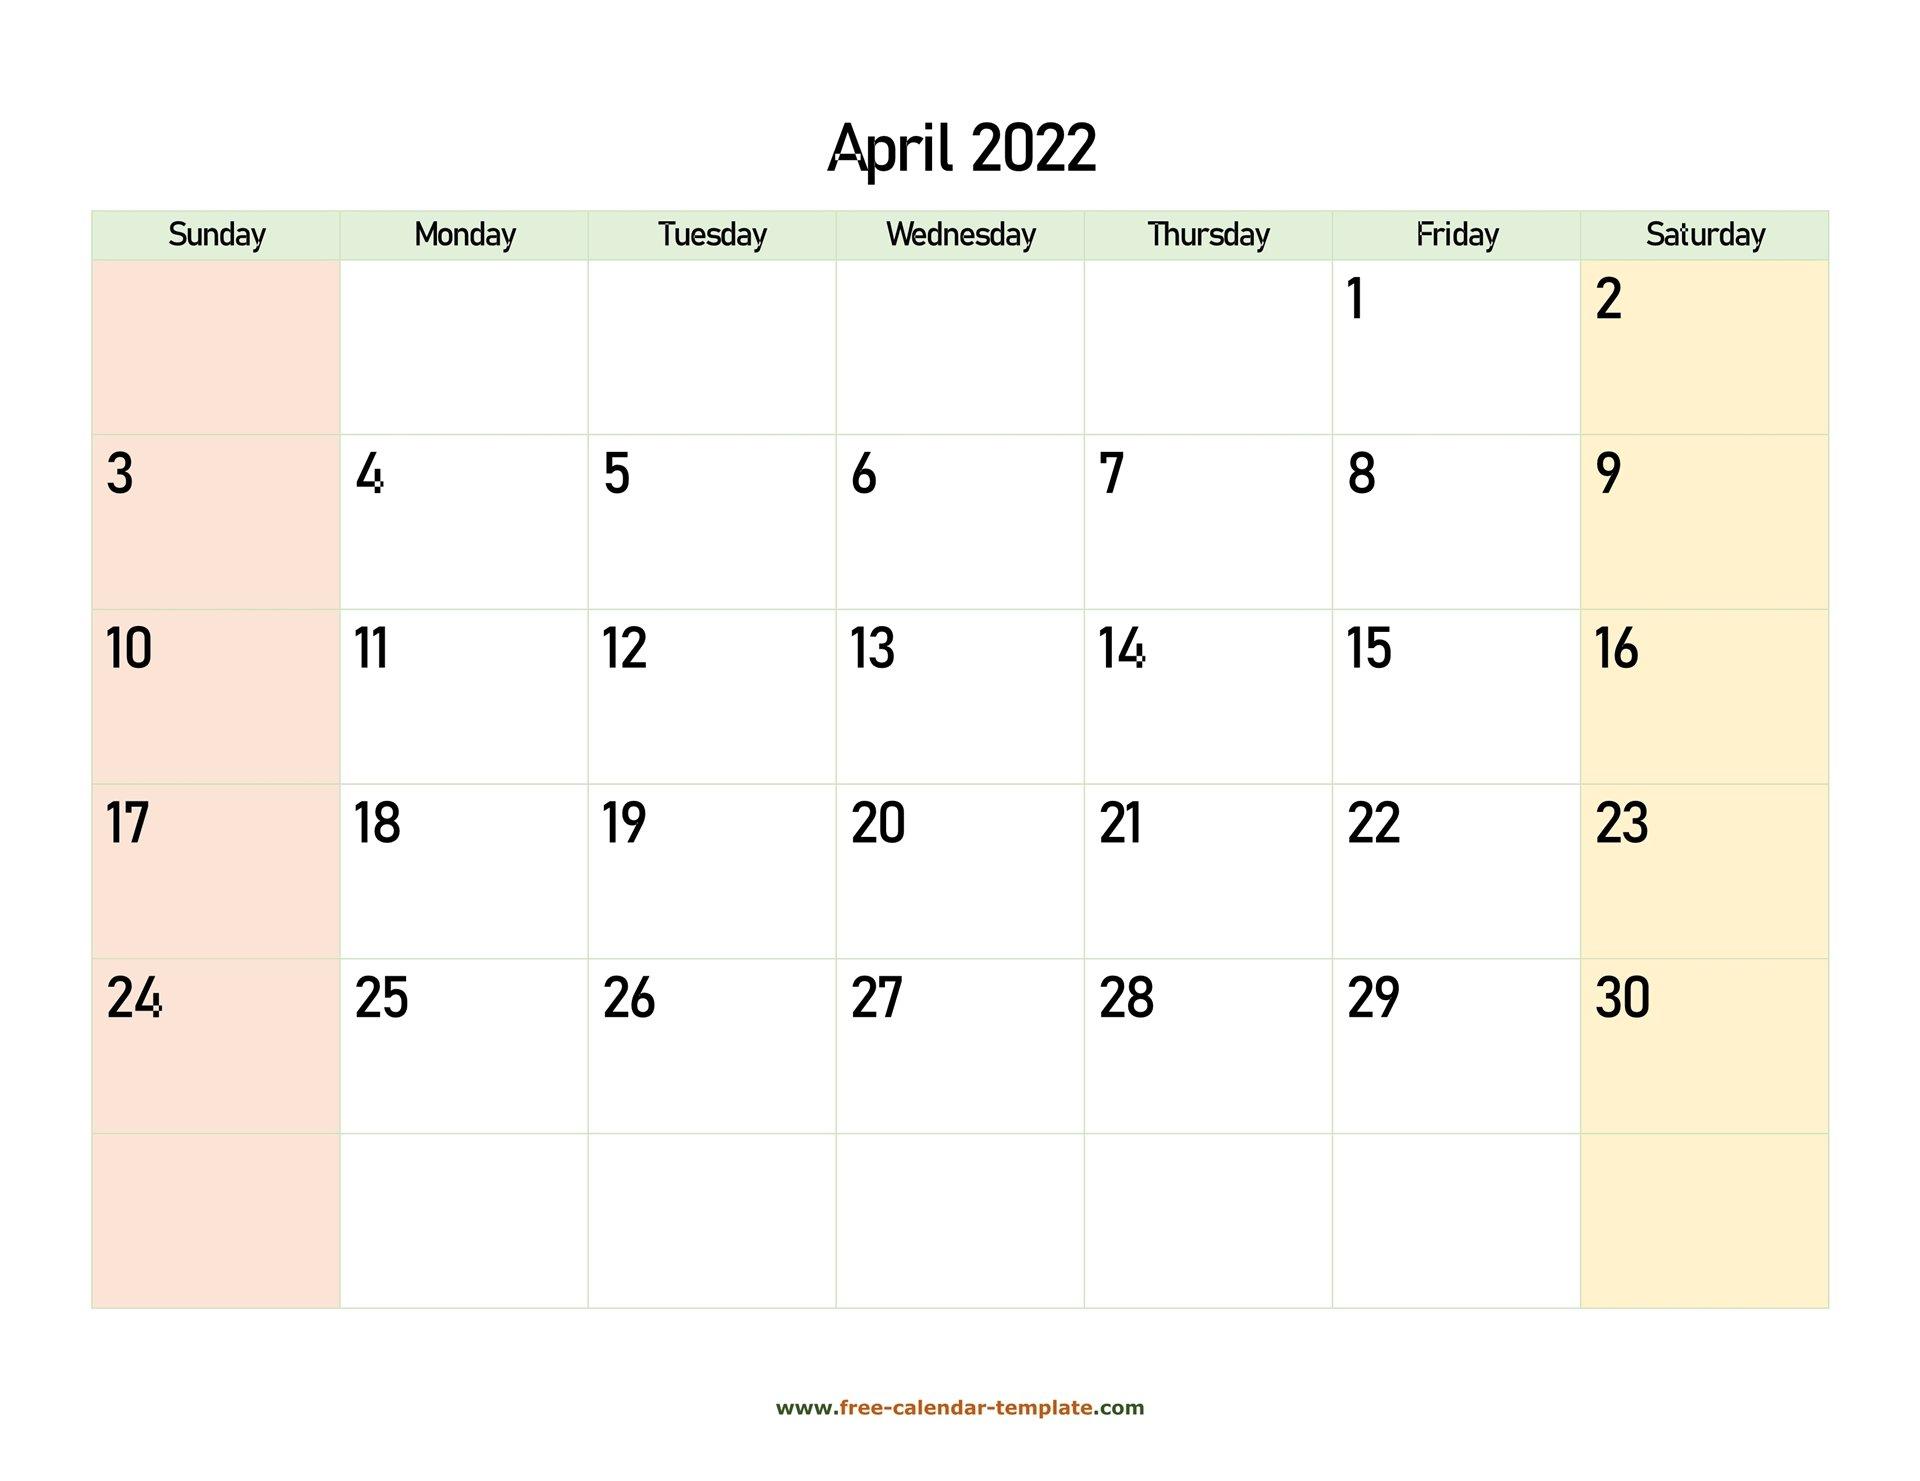 April 2022 Free Calendar Tempplate | Free-Calendar inside Calendar April 2022 Printable Pdf Graphics